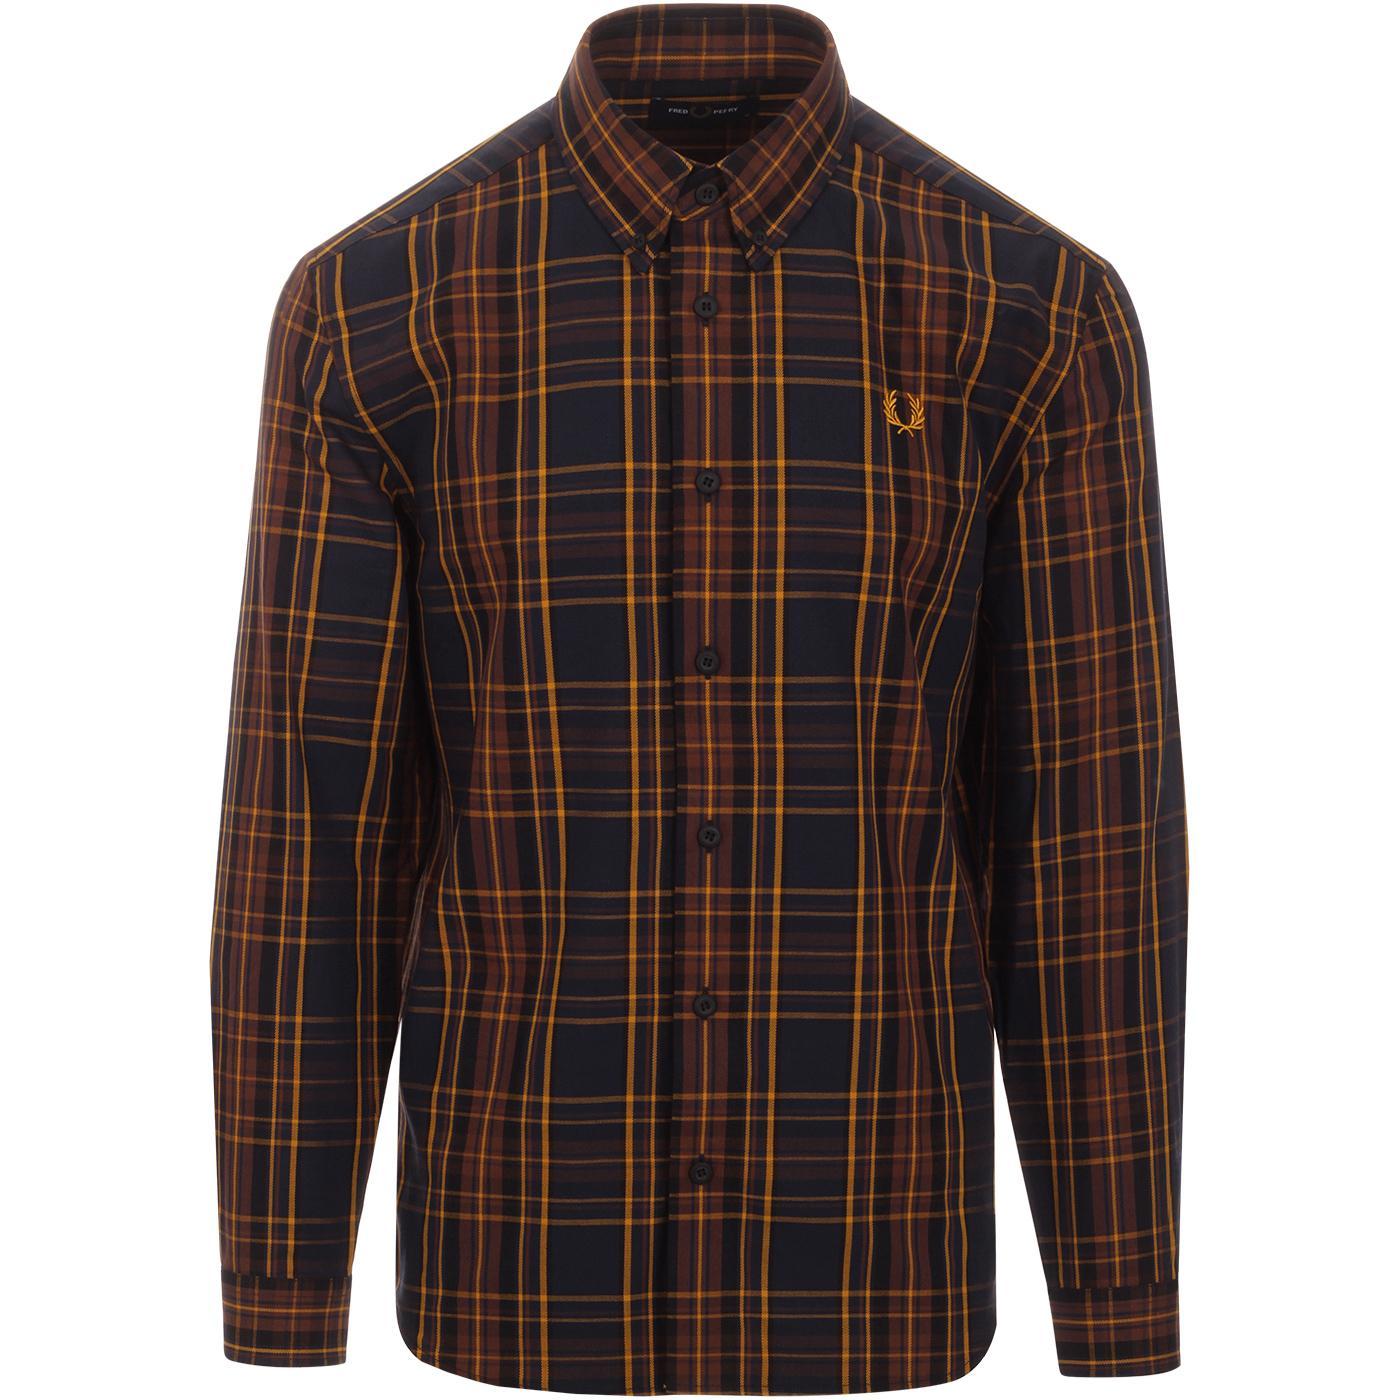 FRED PERRY Mod Winter Tartan Button Down Shirt MB